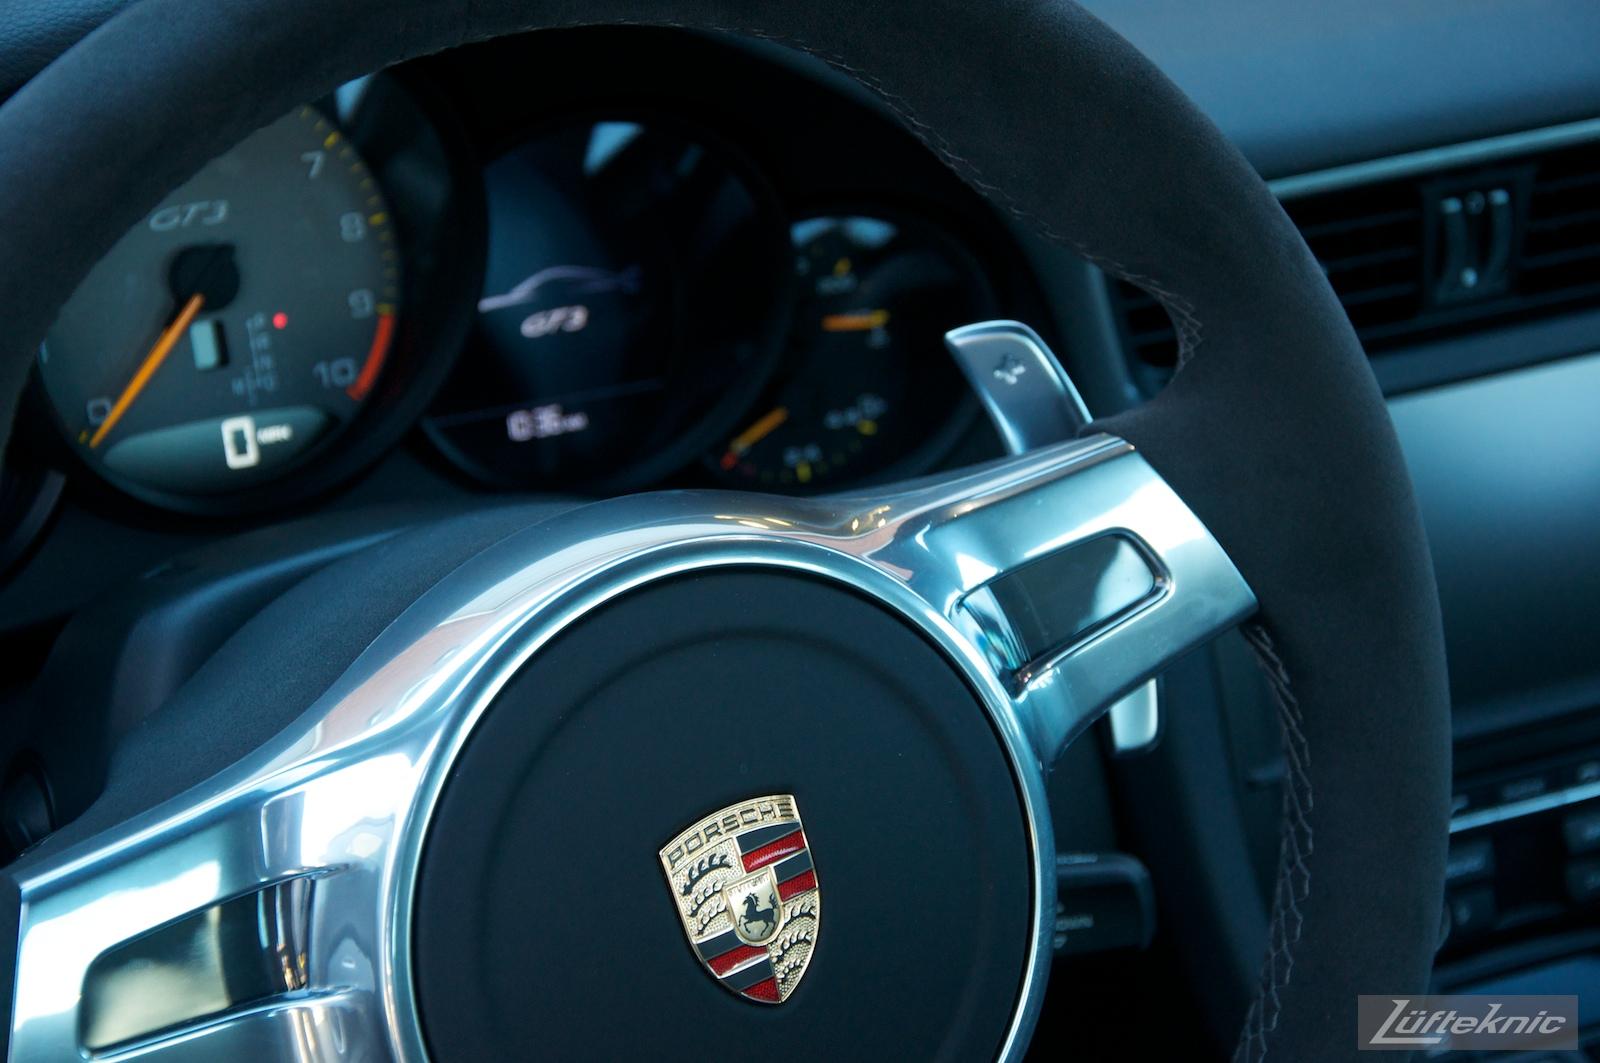 Lüfteknic Porsche 991 GT3 steering wheel and PDK shifter levers